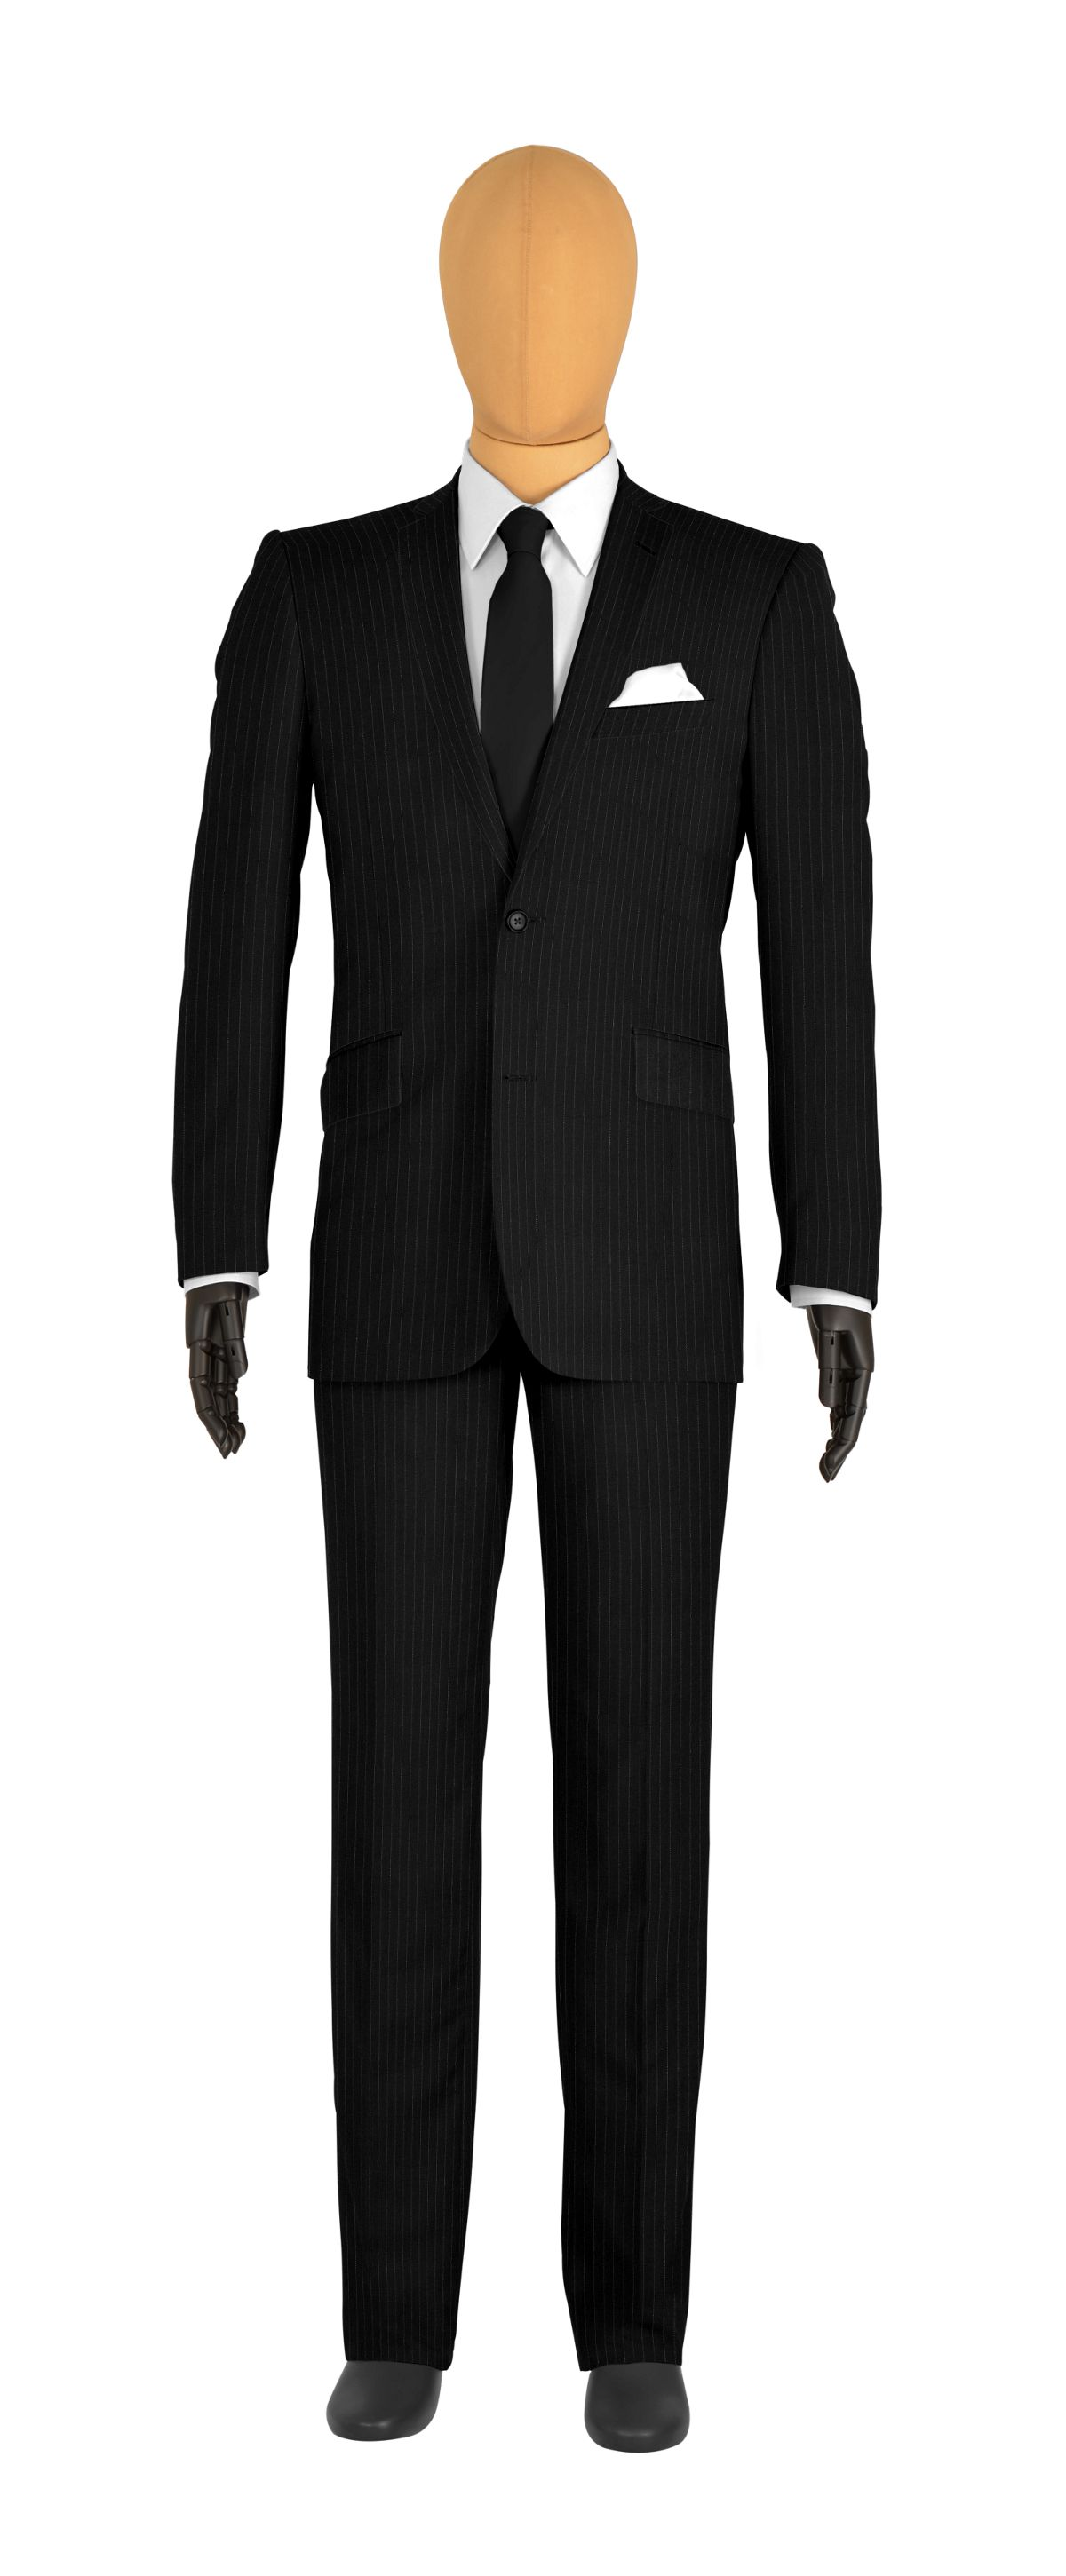 Costume 2 boutons noir rayé